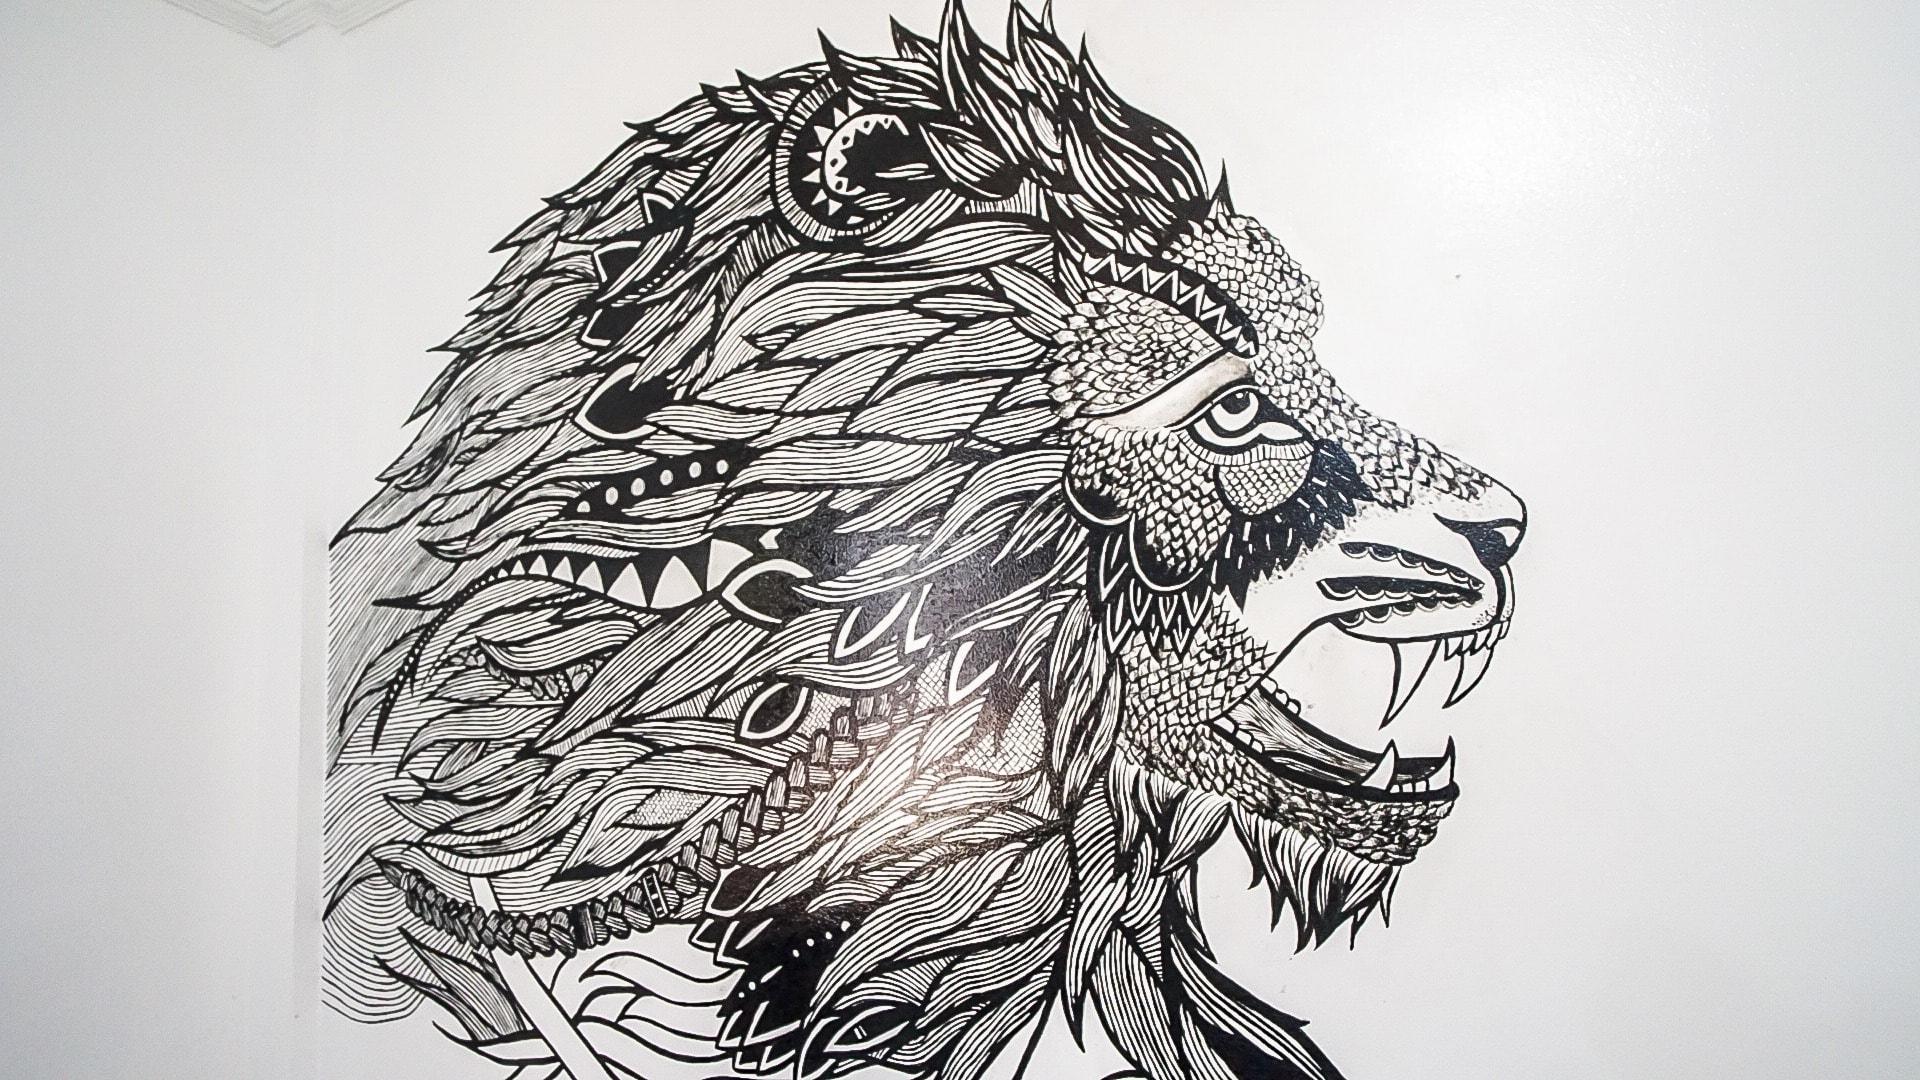 HOSTEL - Lions Den Backpackers Manila